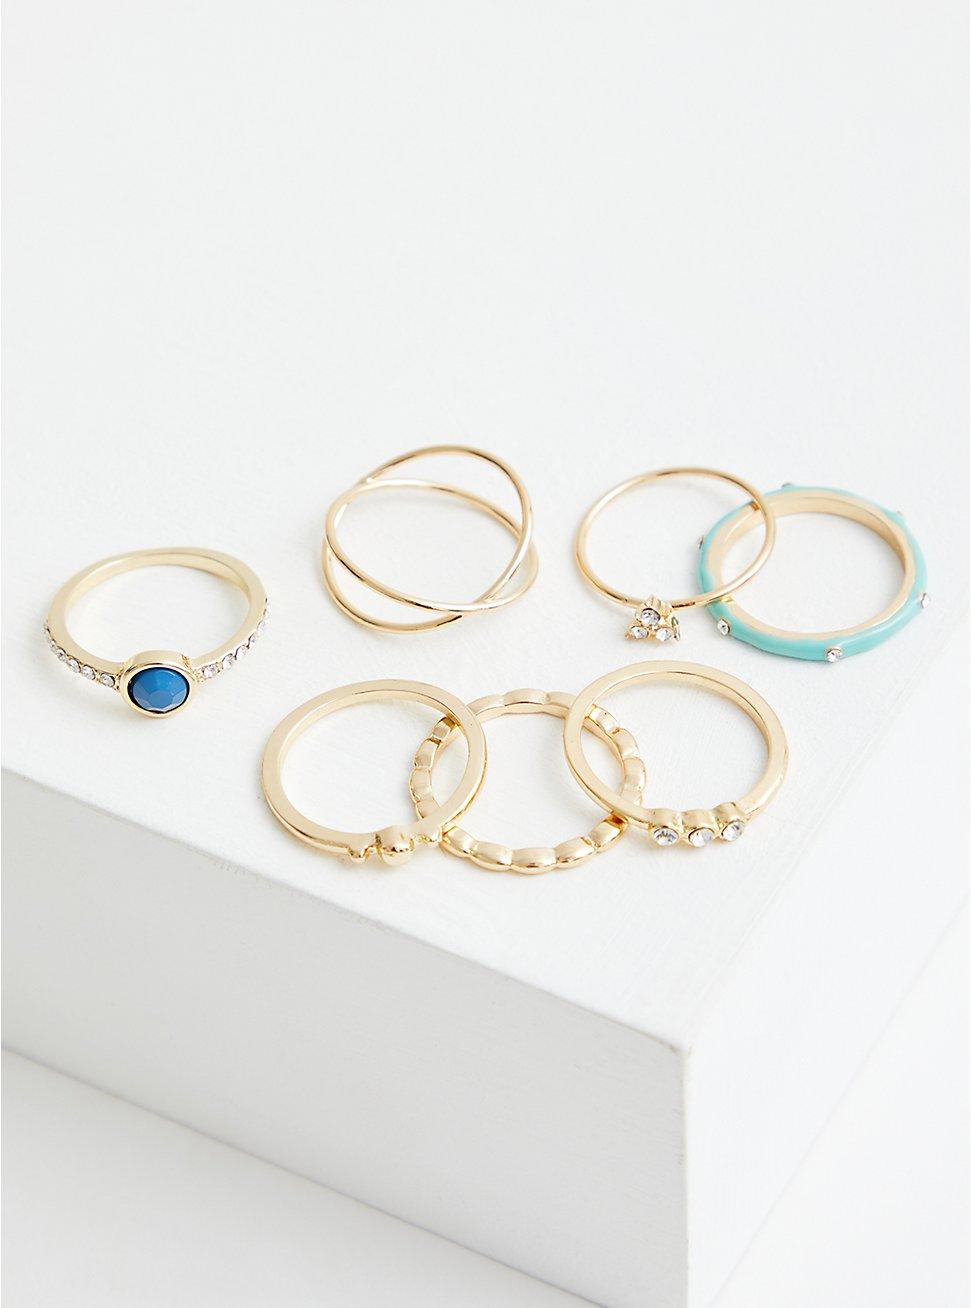 Gold Tone Turquoise Enamel Ring Set of 7, MULTI, hi-res